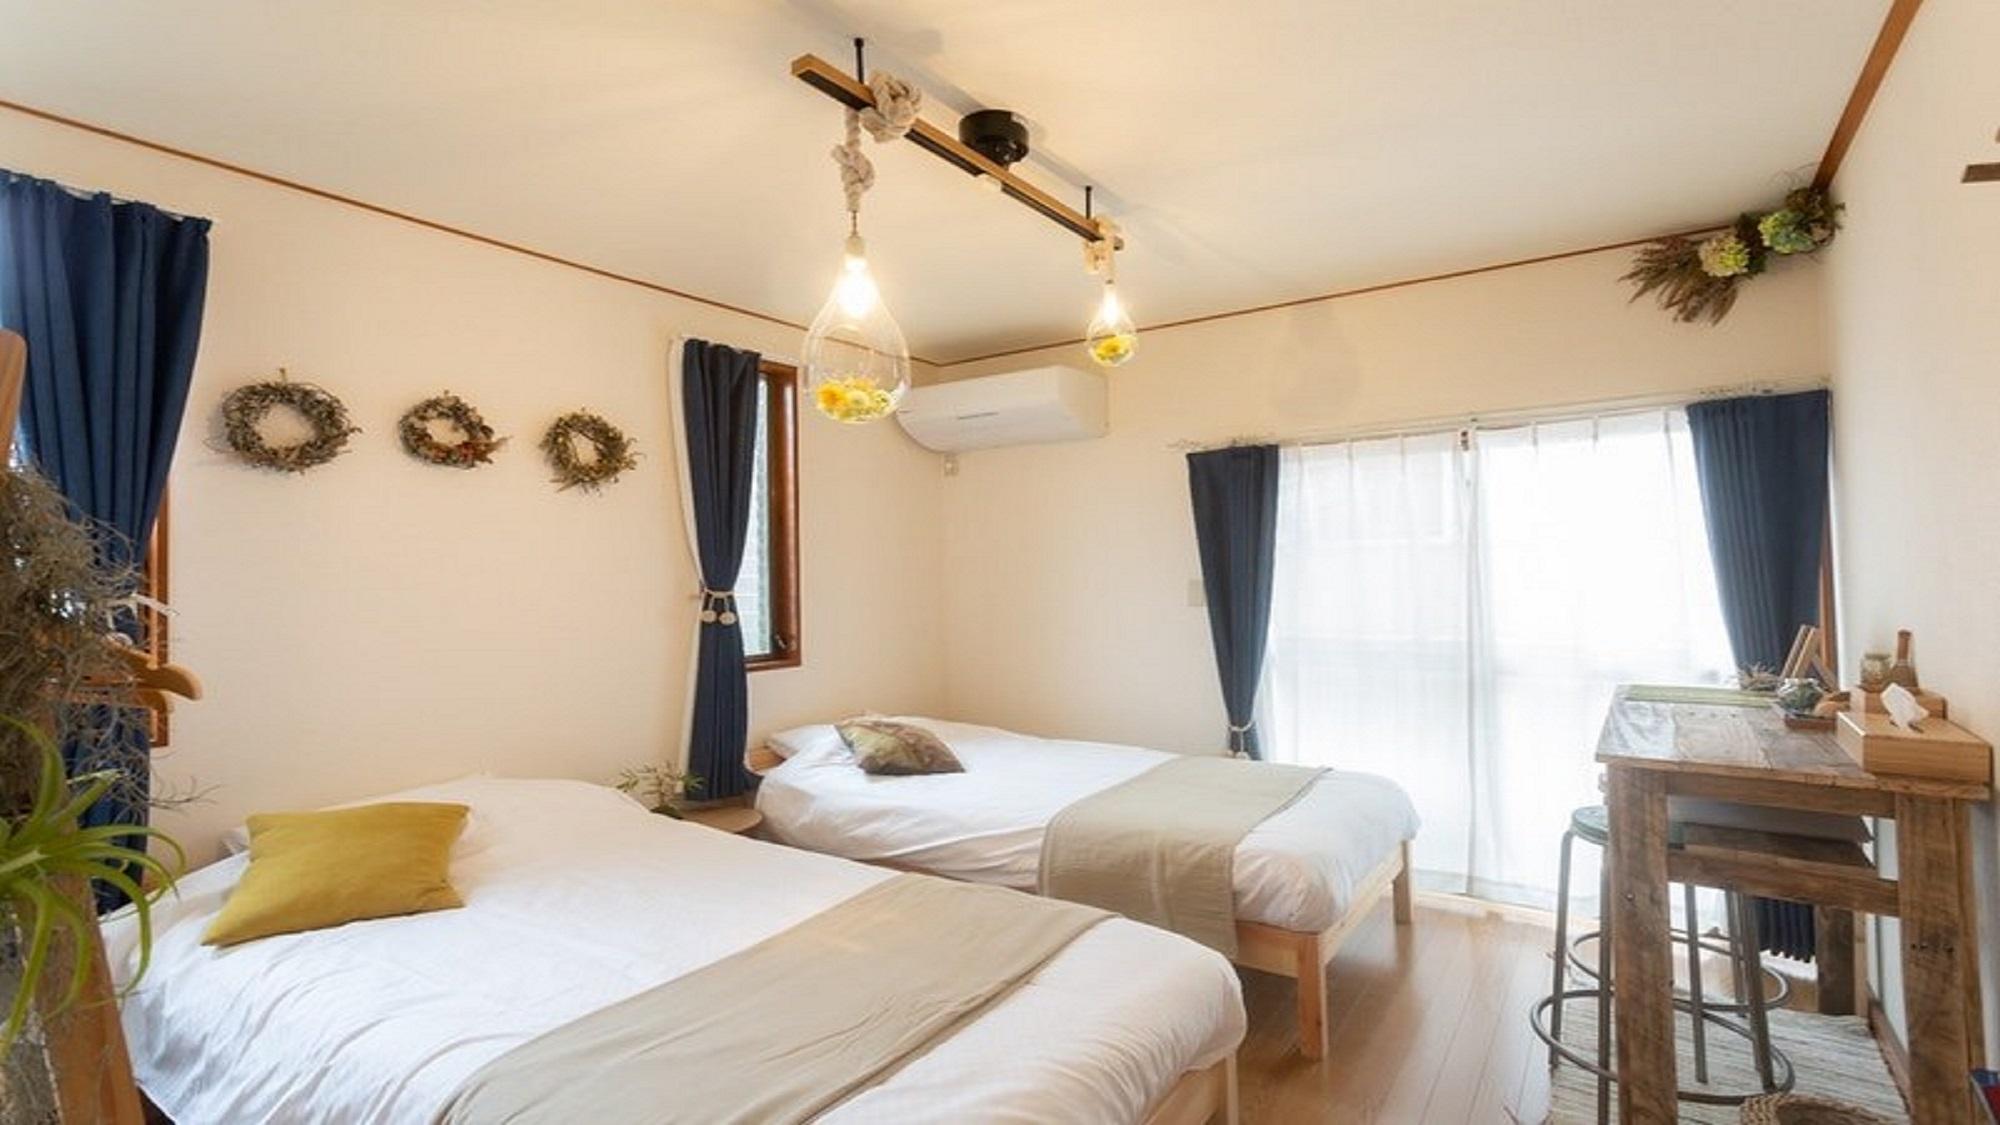 Tipy records inn【Vacation STAY提供】